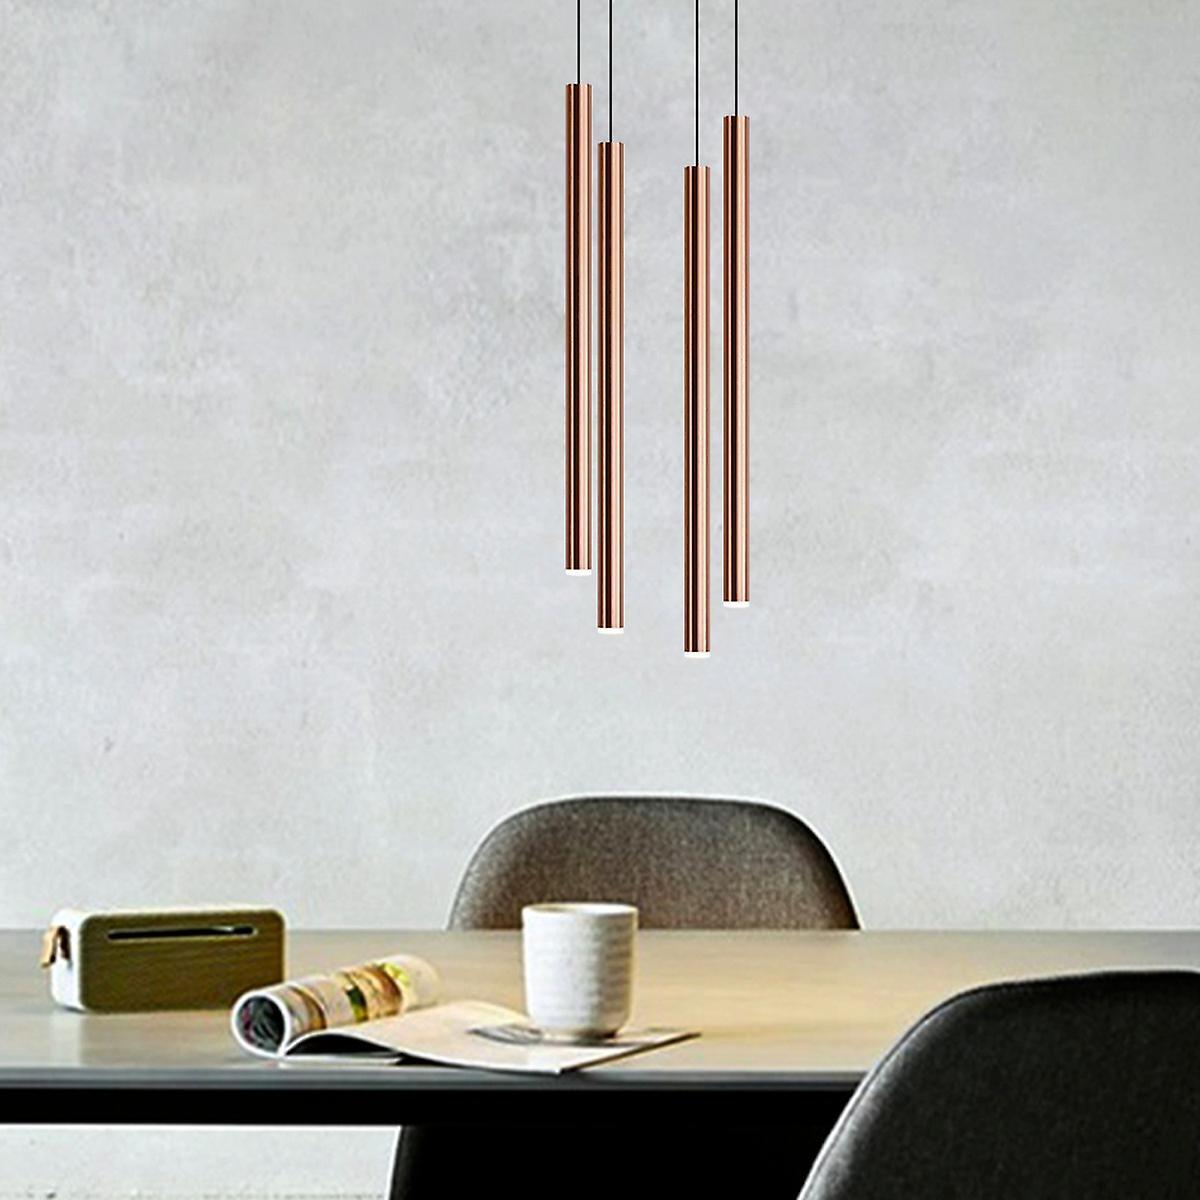 Modern Vintage Hanging Ceiling Pendant Light Fixture Brass 4 Pendant Square Canopy